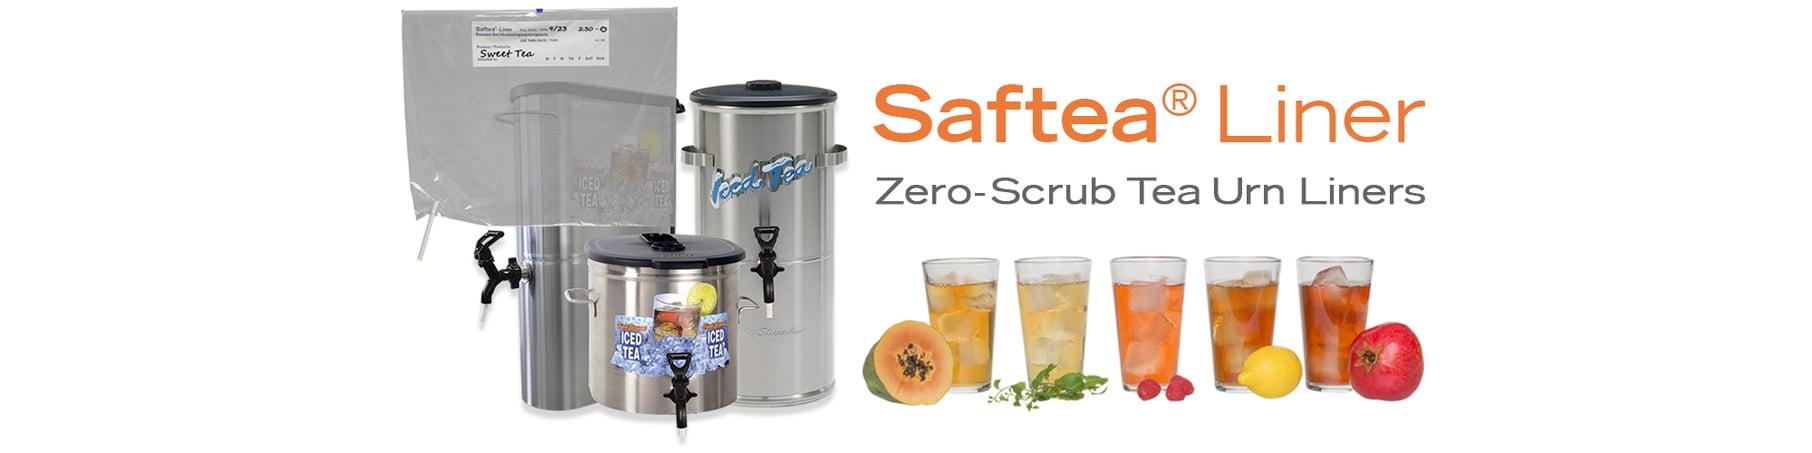 Saftea® Iced Tea Urn Liners